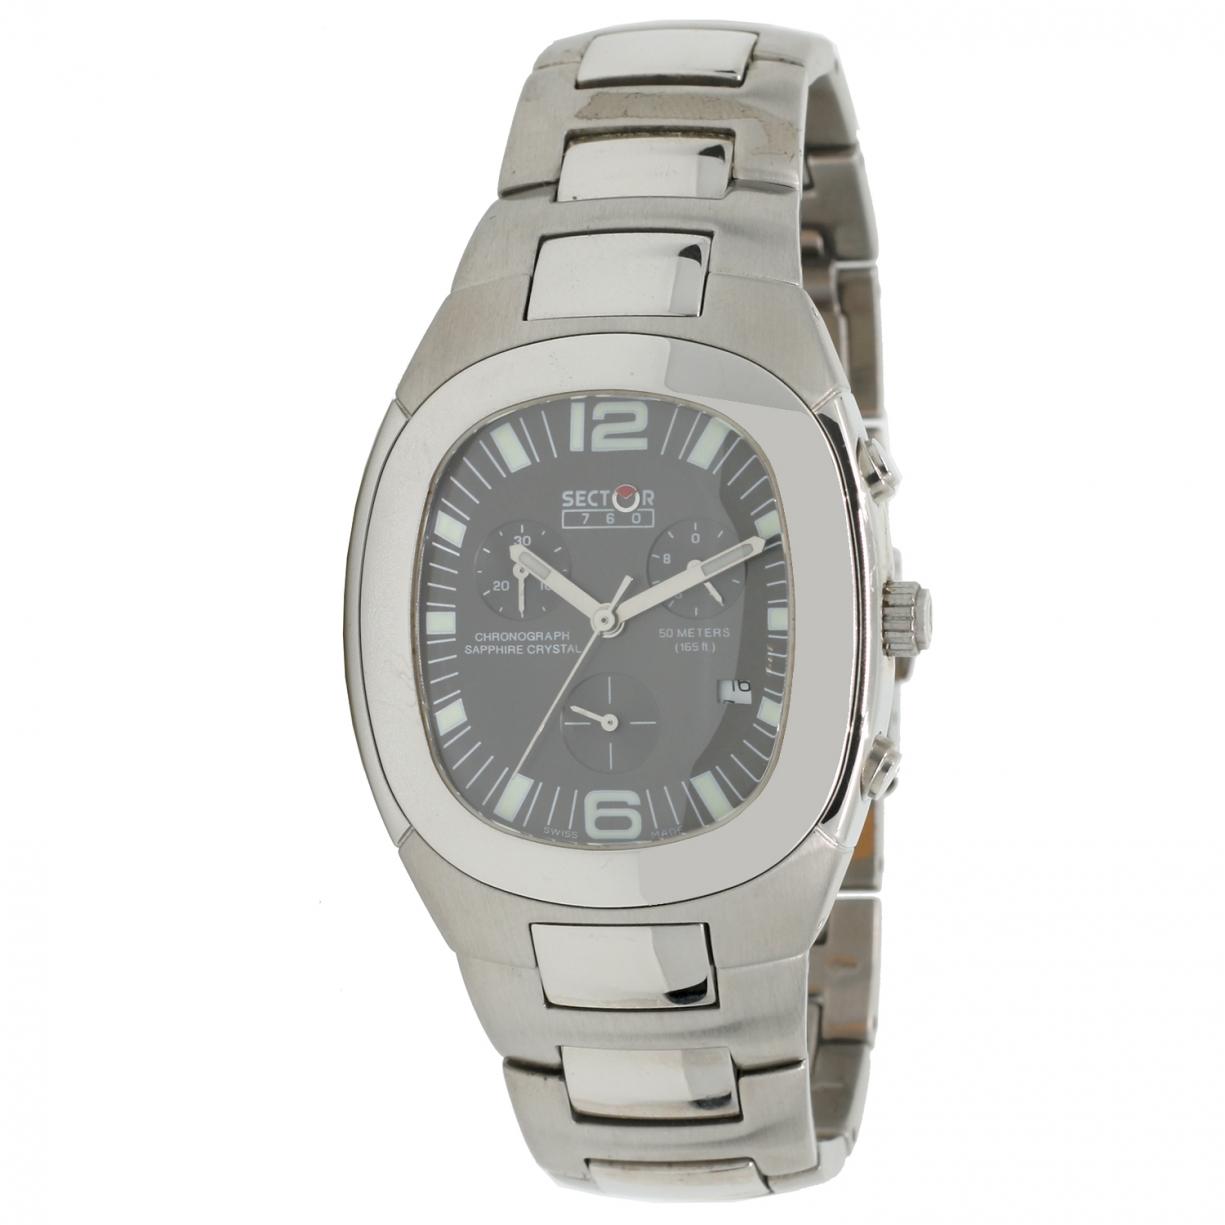 37e0e125e856 Reloj De Pulsera Sector Analogico Para Hombre. Modelo Sec78016